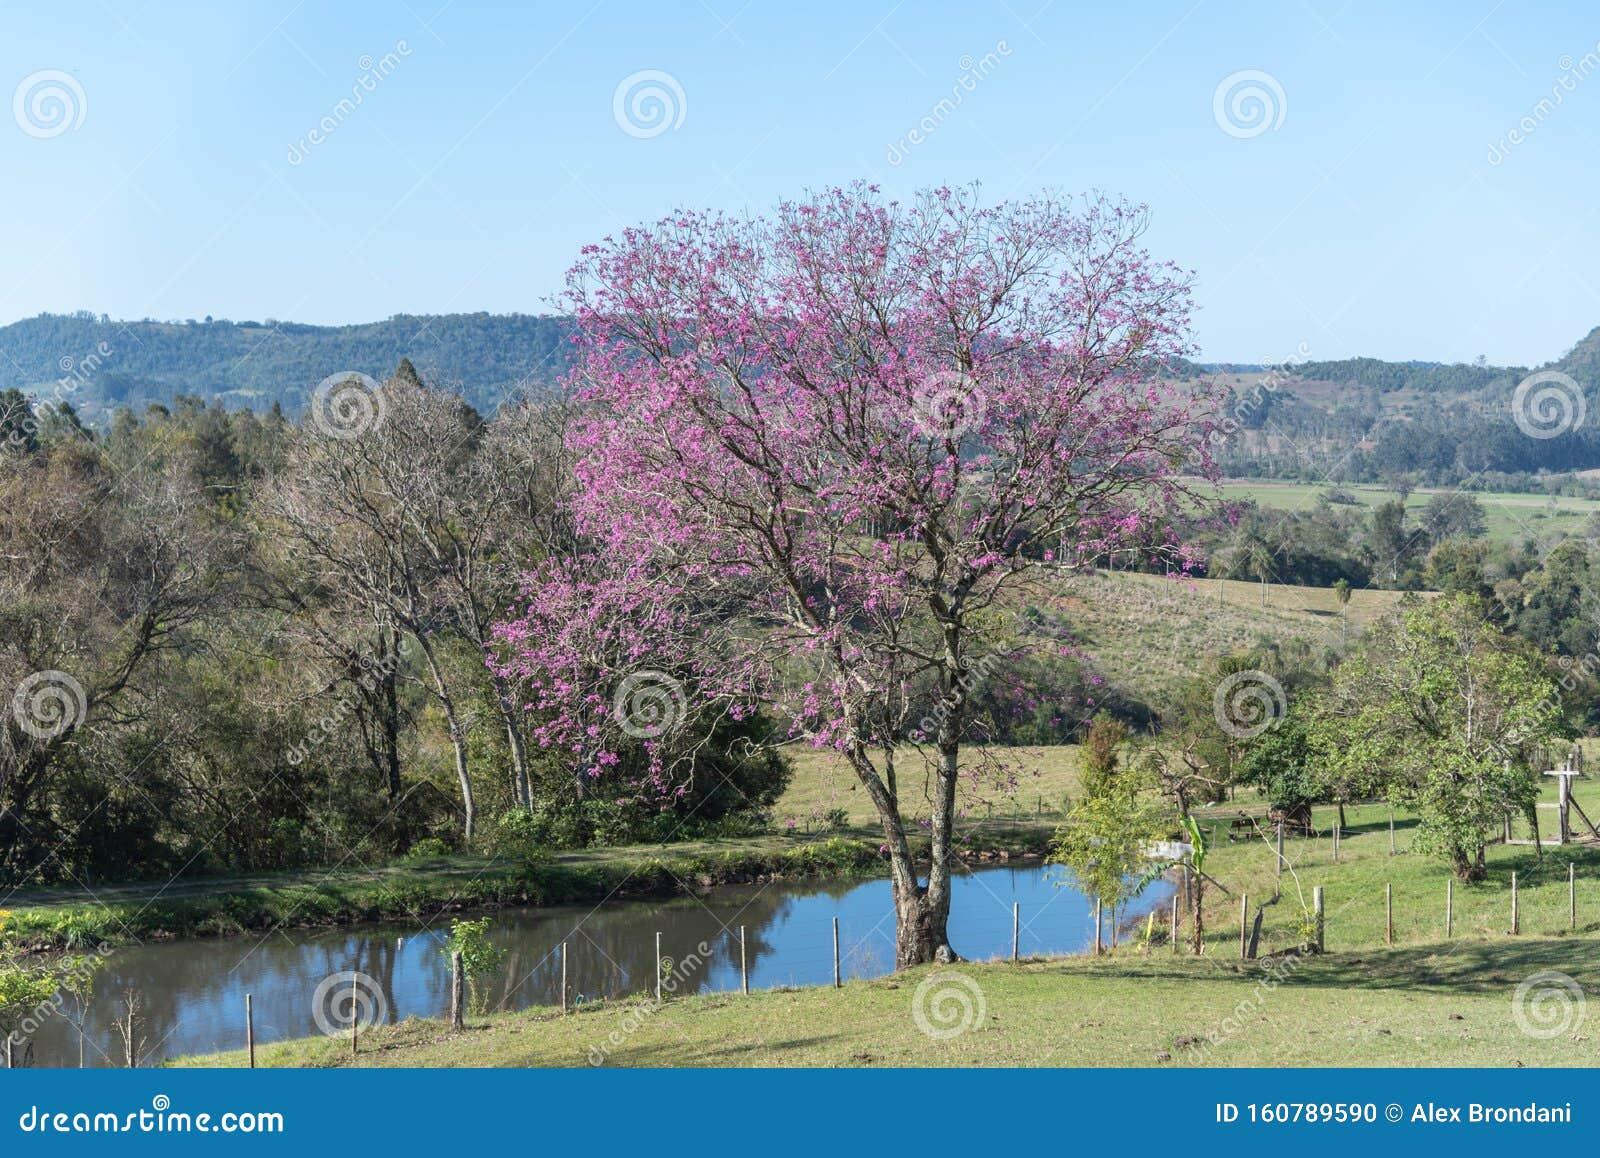 Rural Landscape Purple Ipe Tree And Small Lake 01 Stock Photo